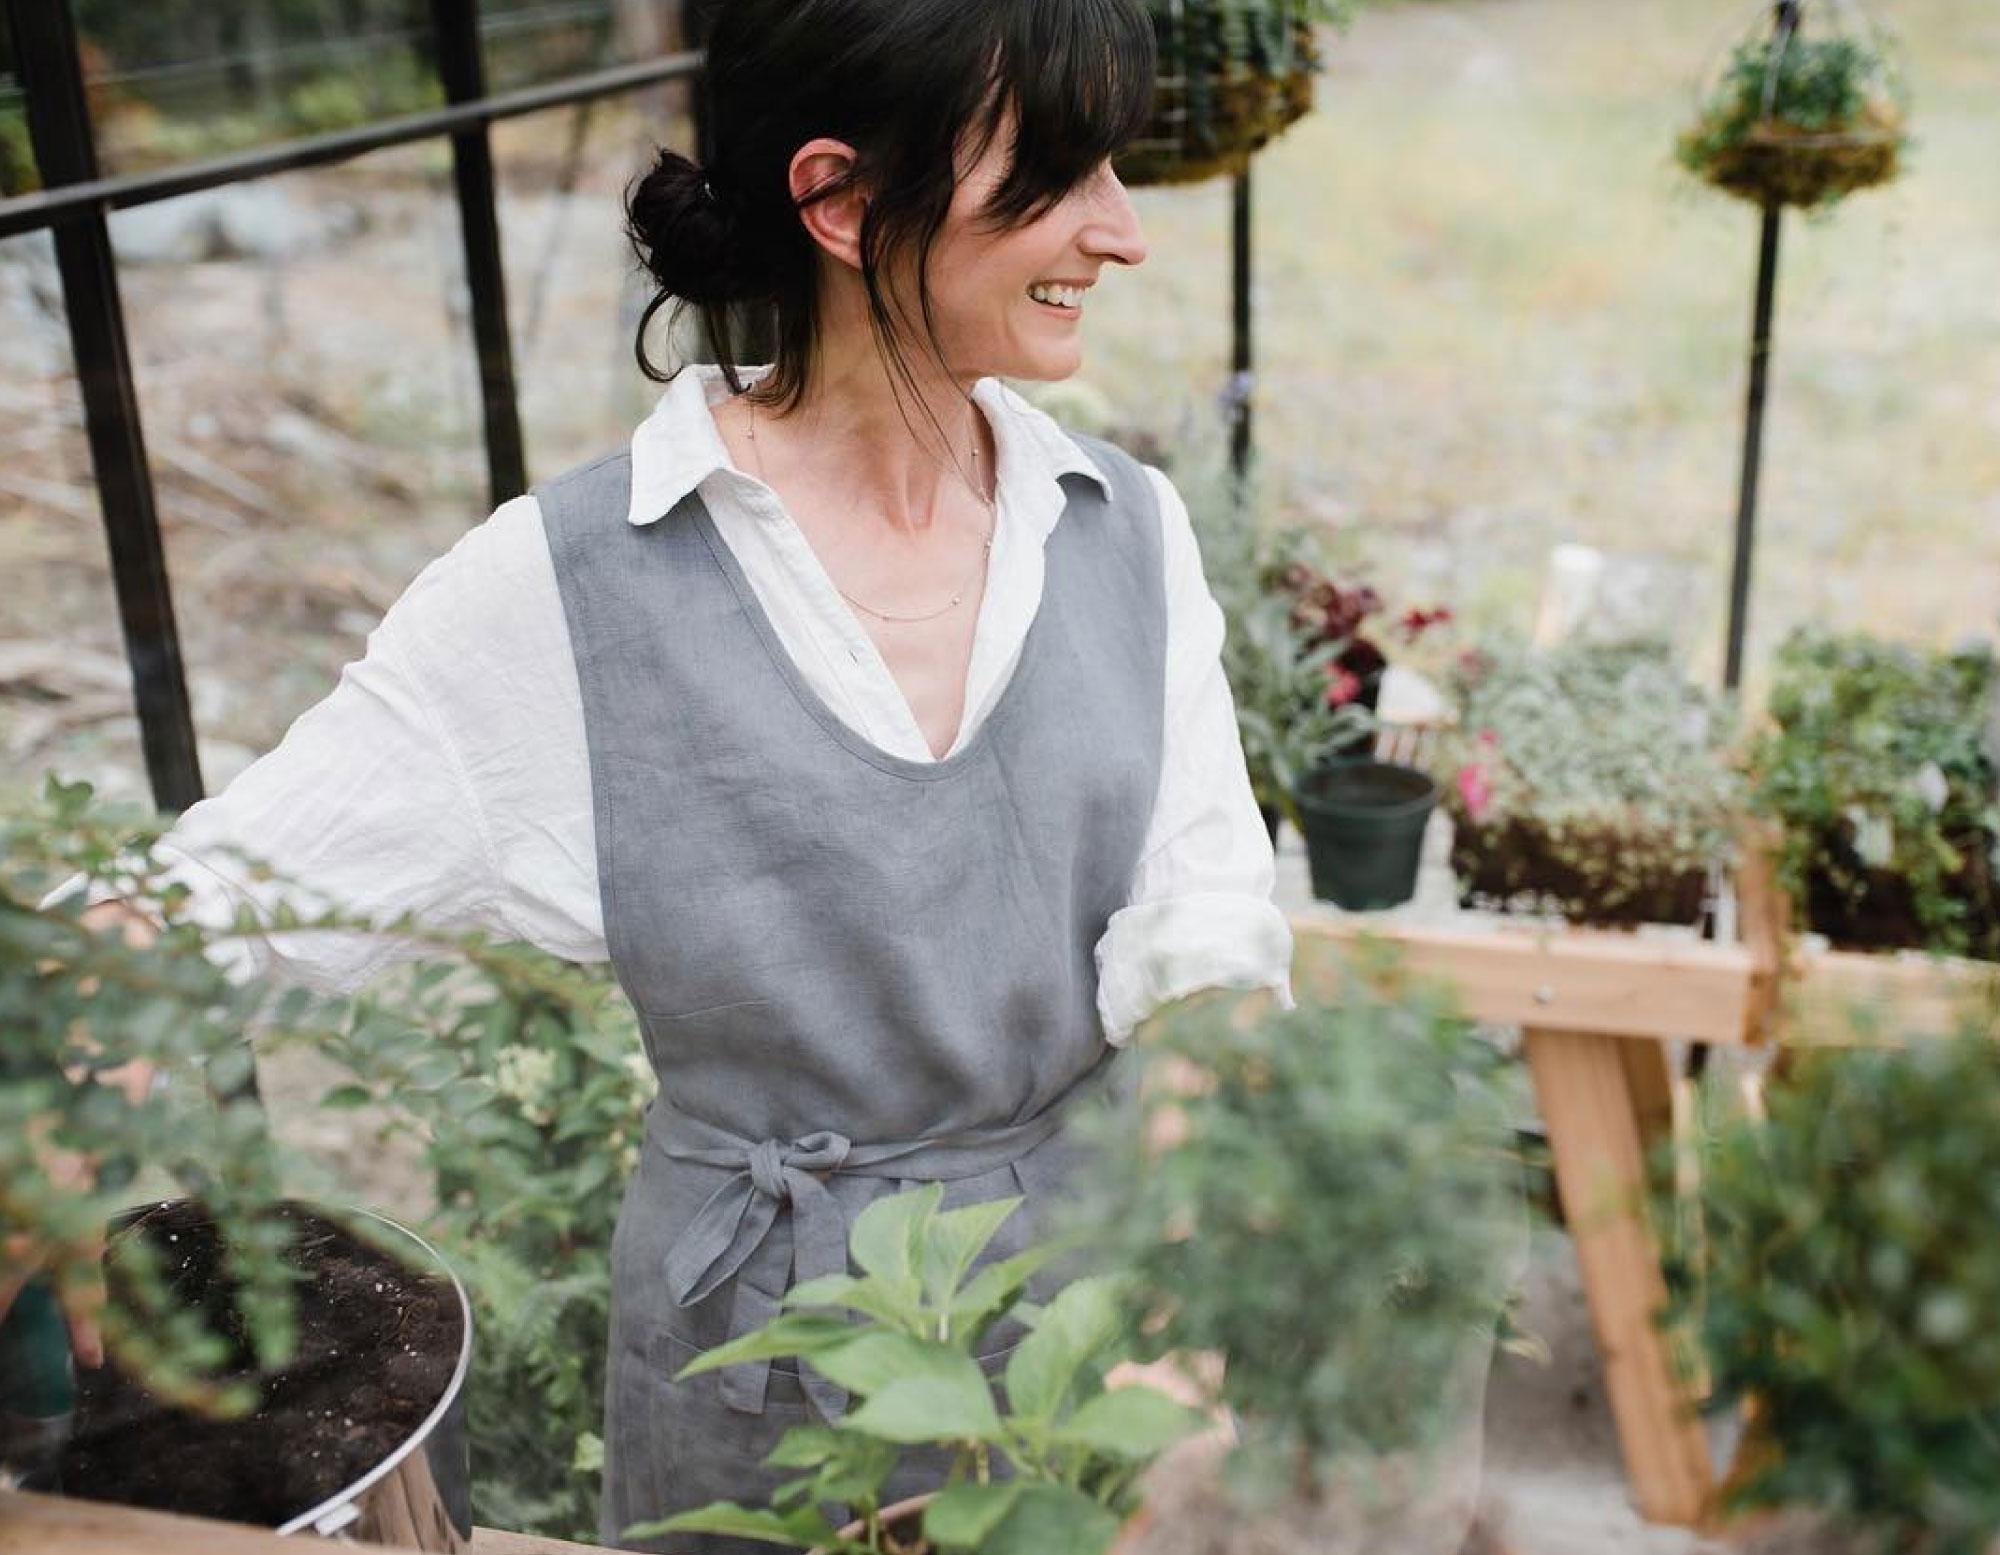 From the Garden Shed Catherine Karpman Organic Lavender Farm